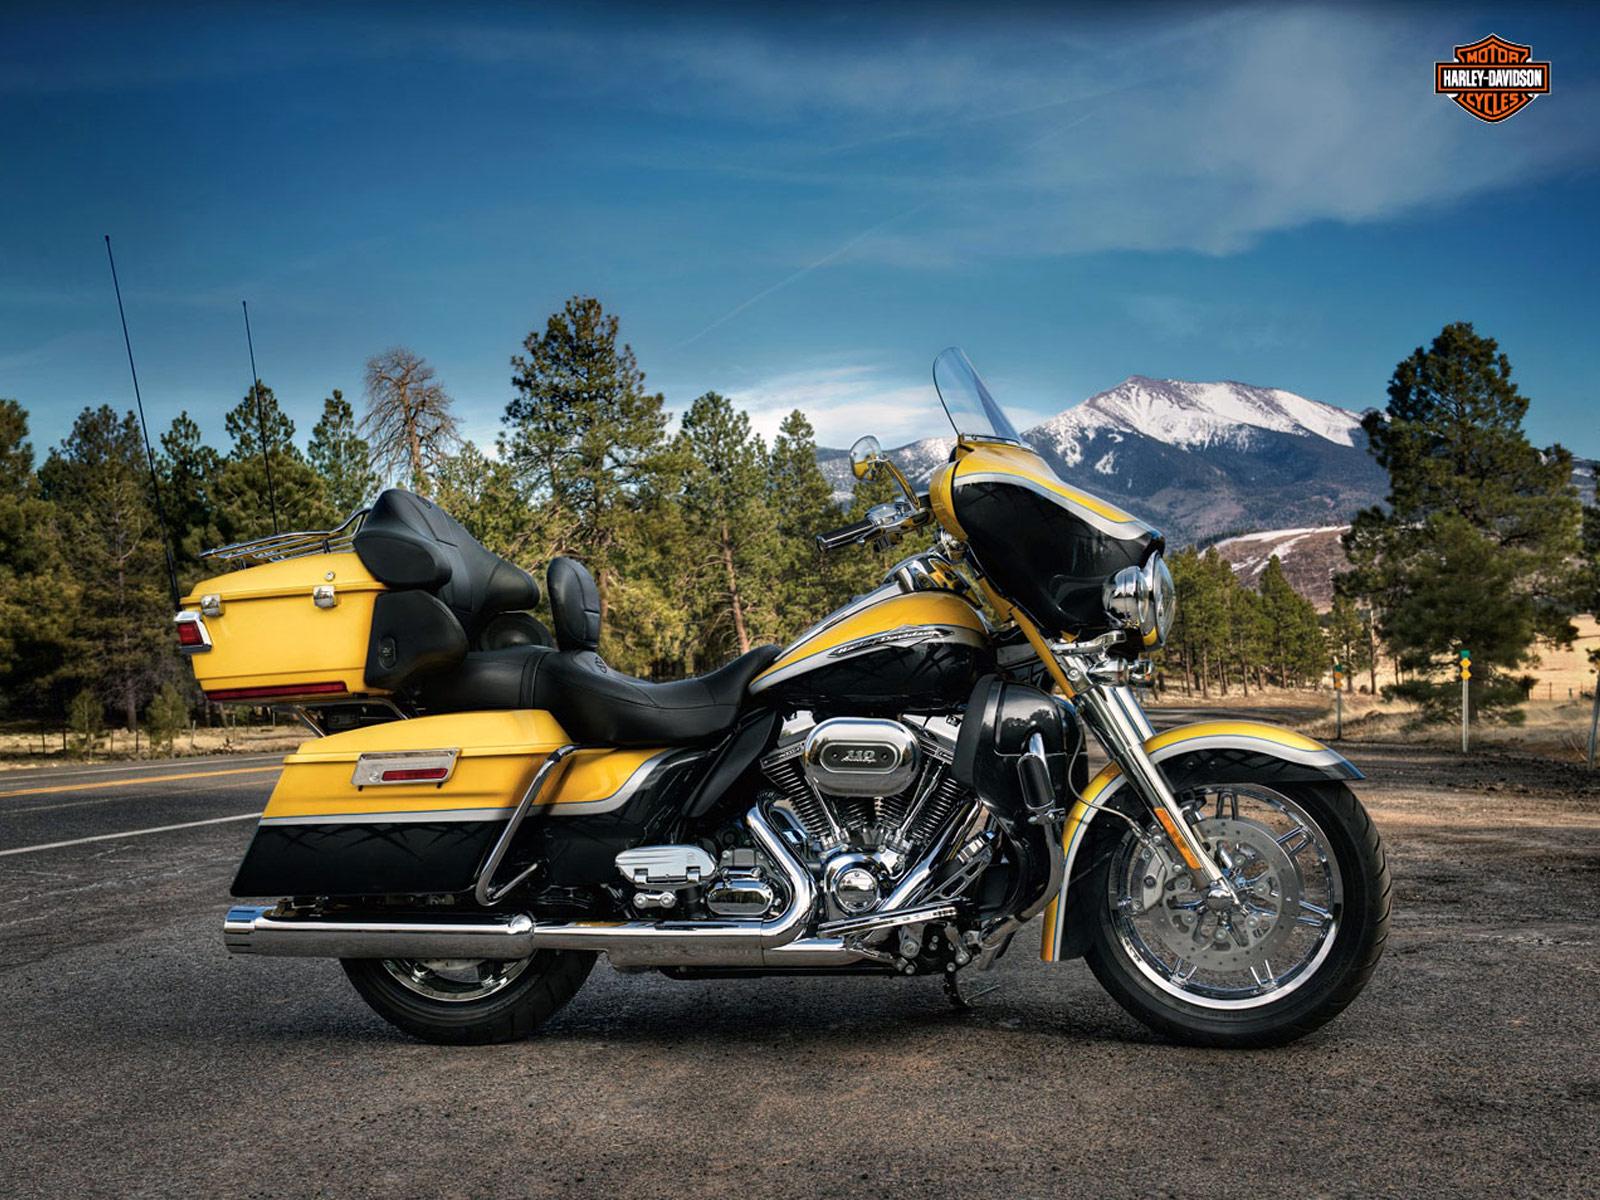 Harley Davidson 2012: 2012 Harley Davidson FLHTCUSE7 CVO Ultra Classic Electra Glide